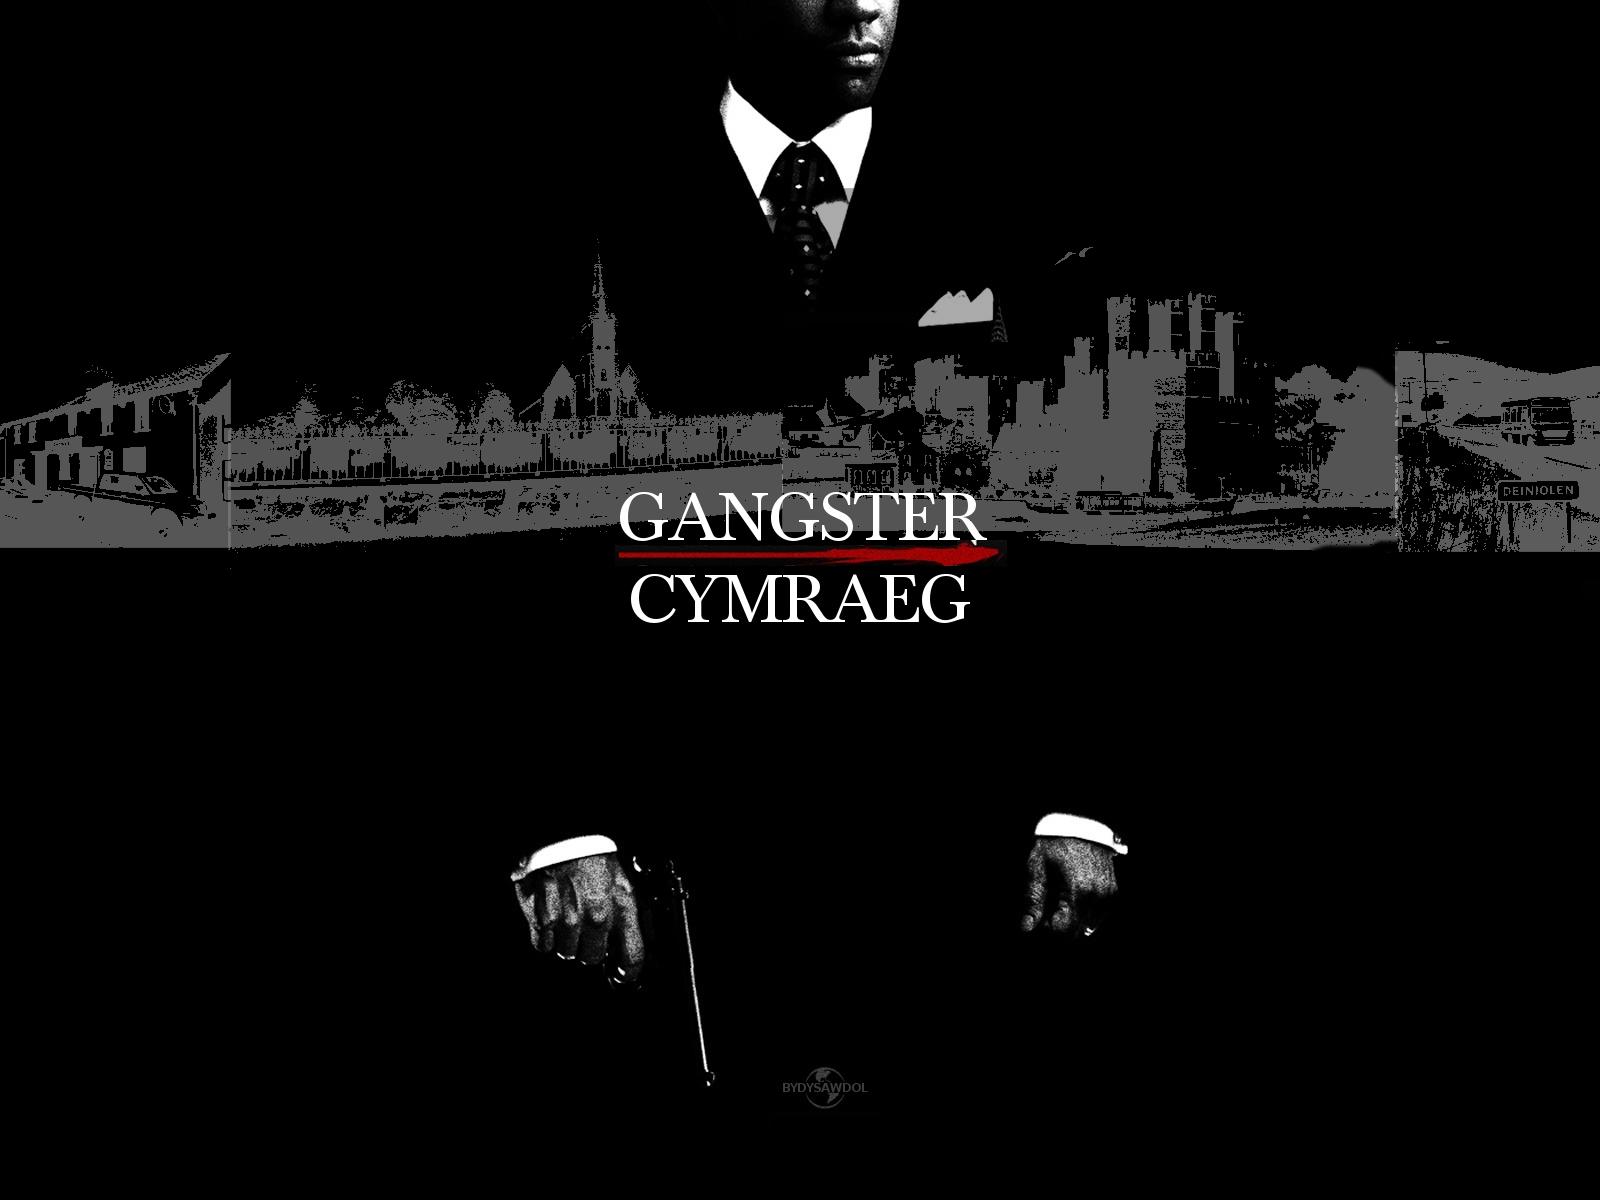 Gangster Cymraeg